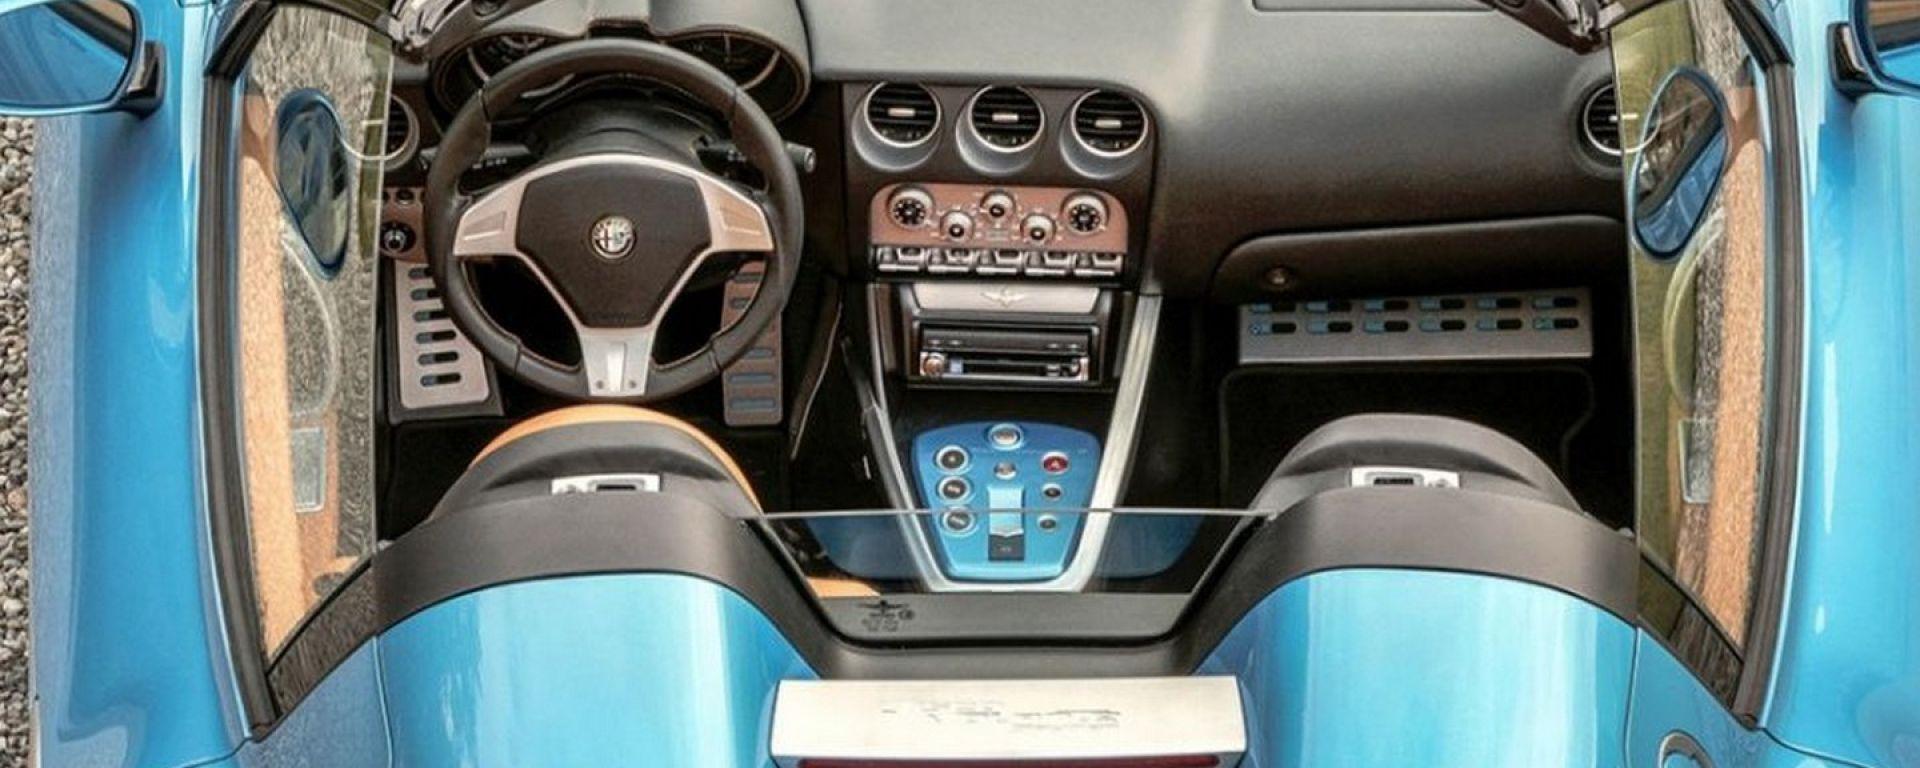 Alfa Romeo Disco Volante Spyder by Touring Superleggera